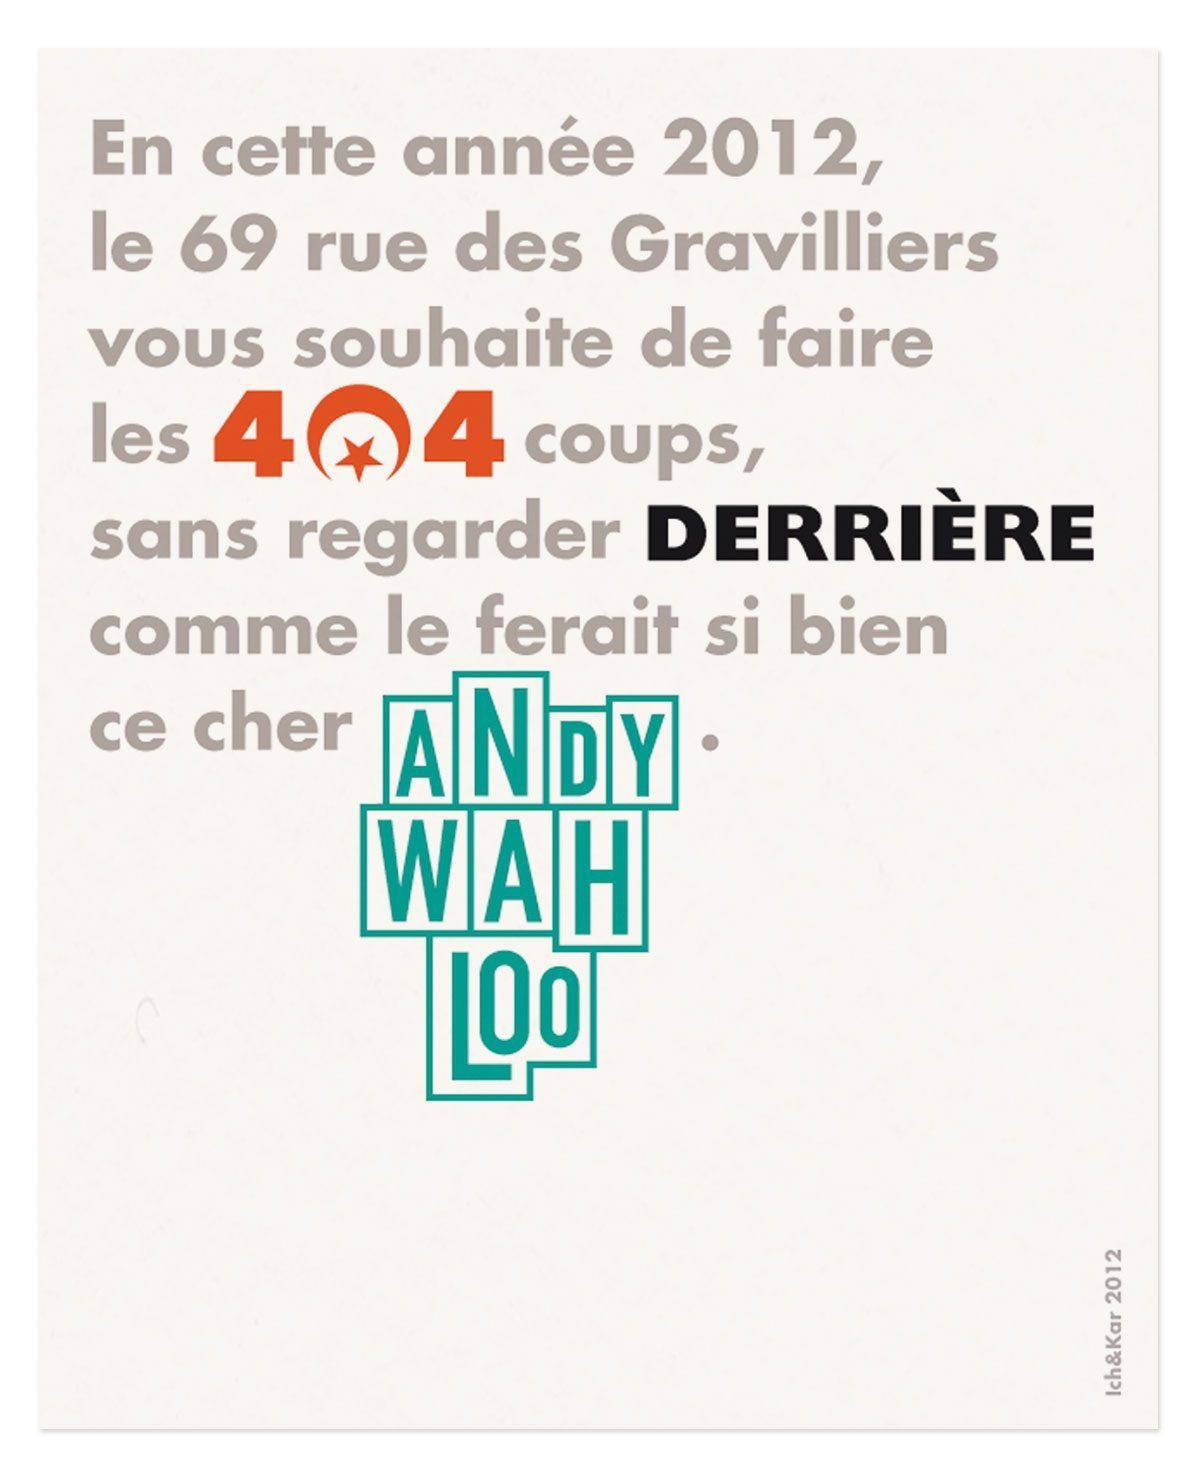 404 derrière andy wahloo 69 rue des gravilliers vœux 2012